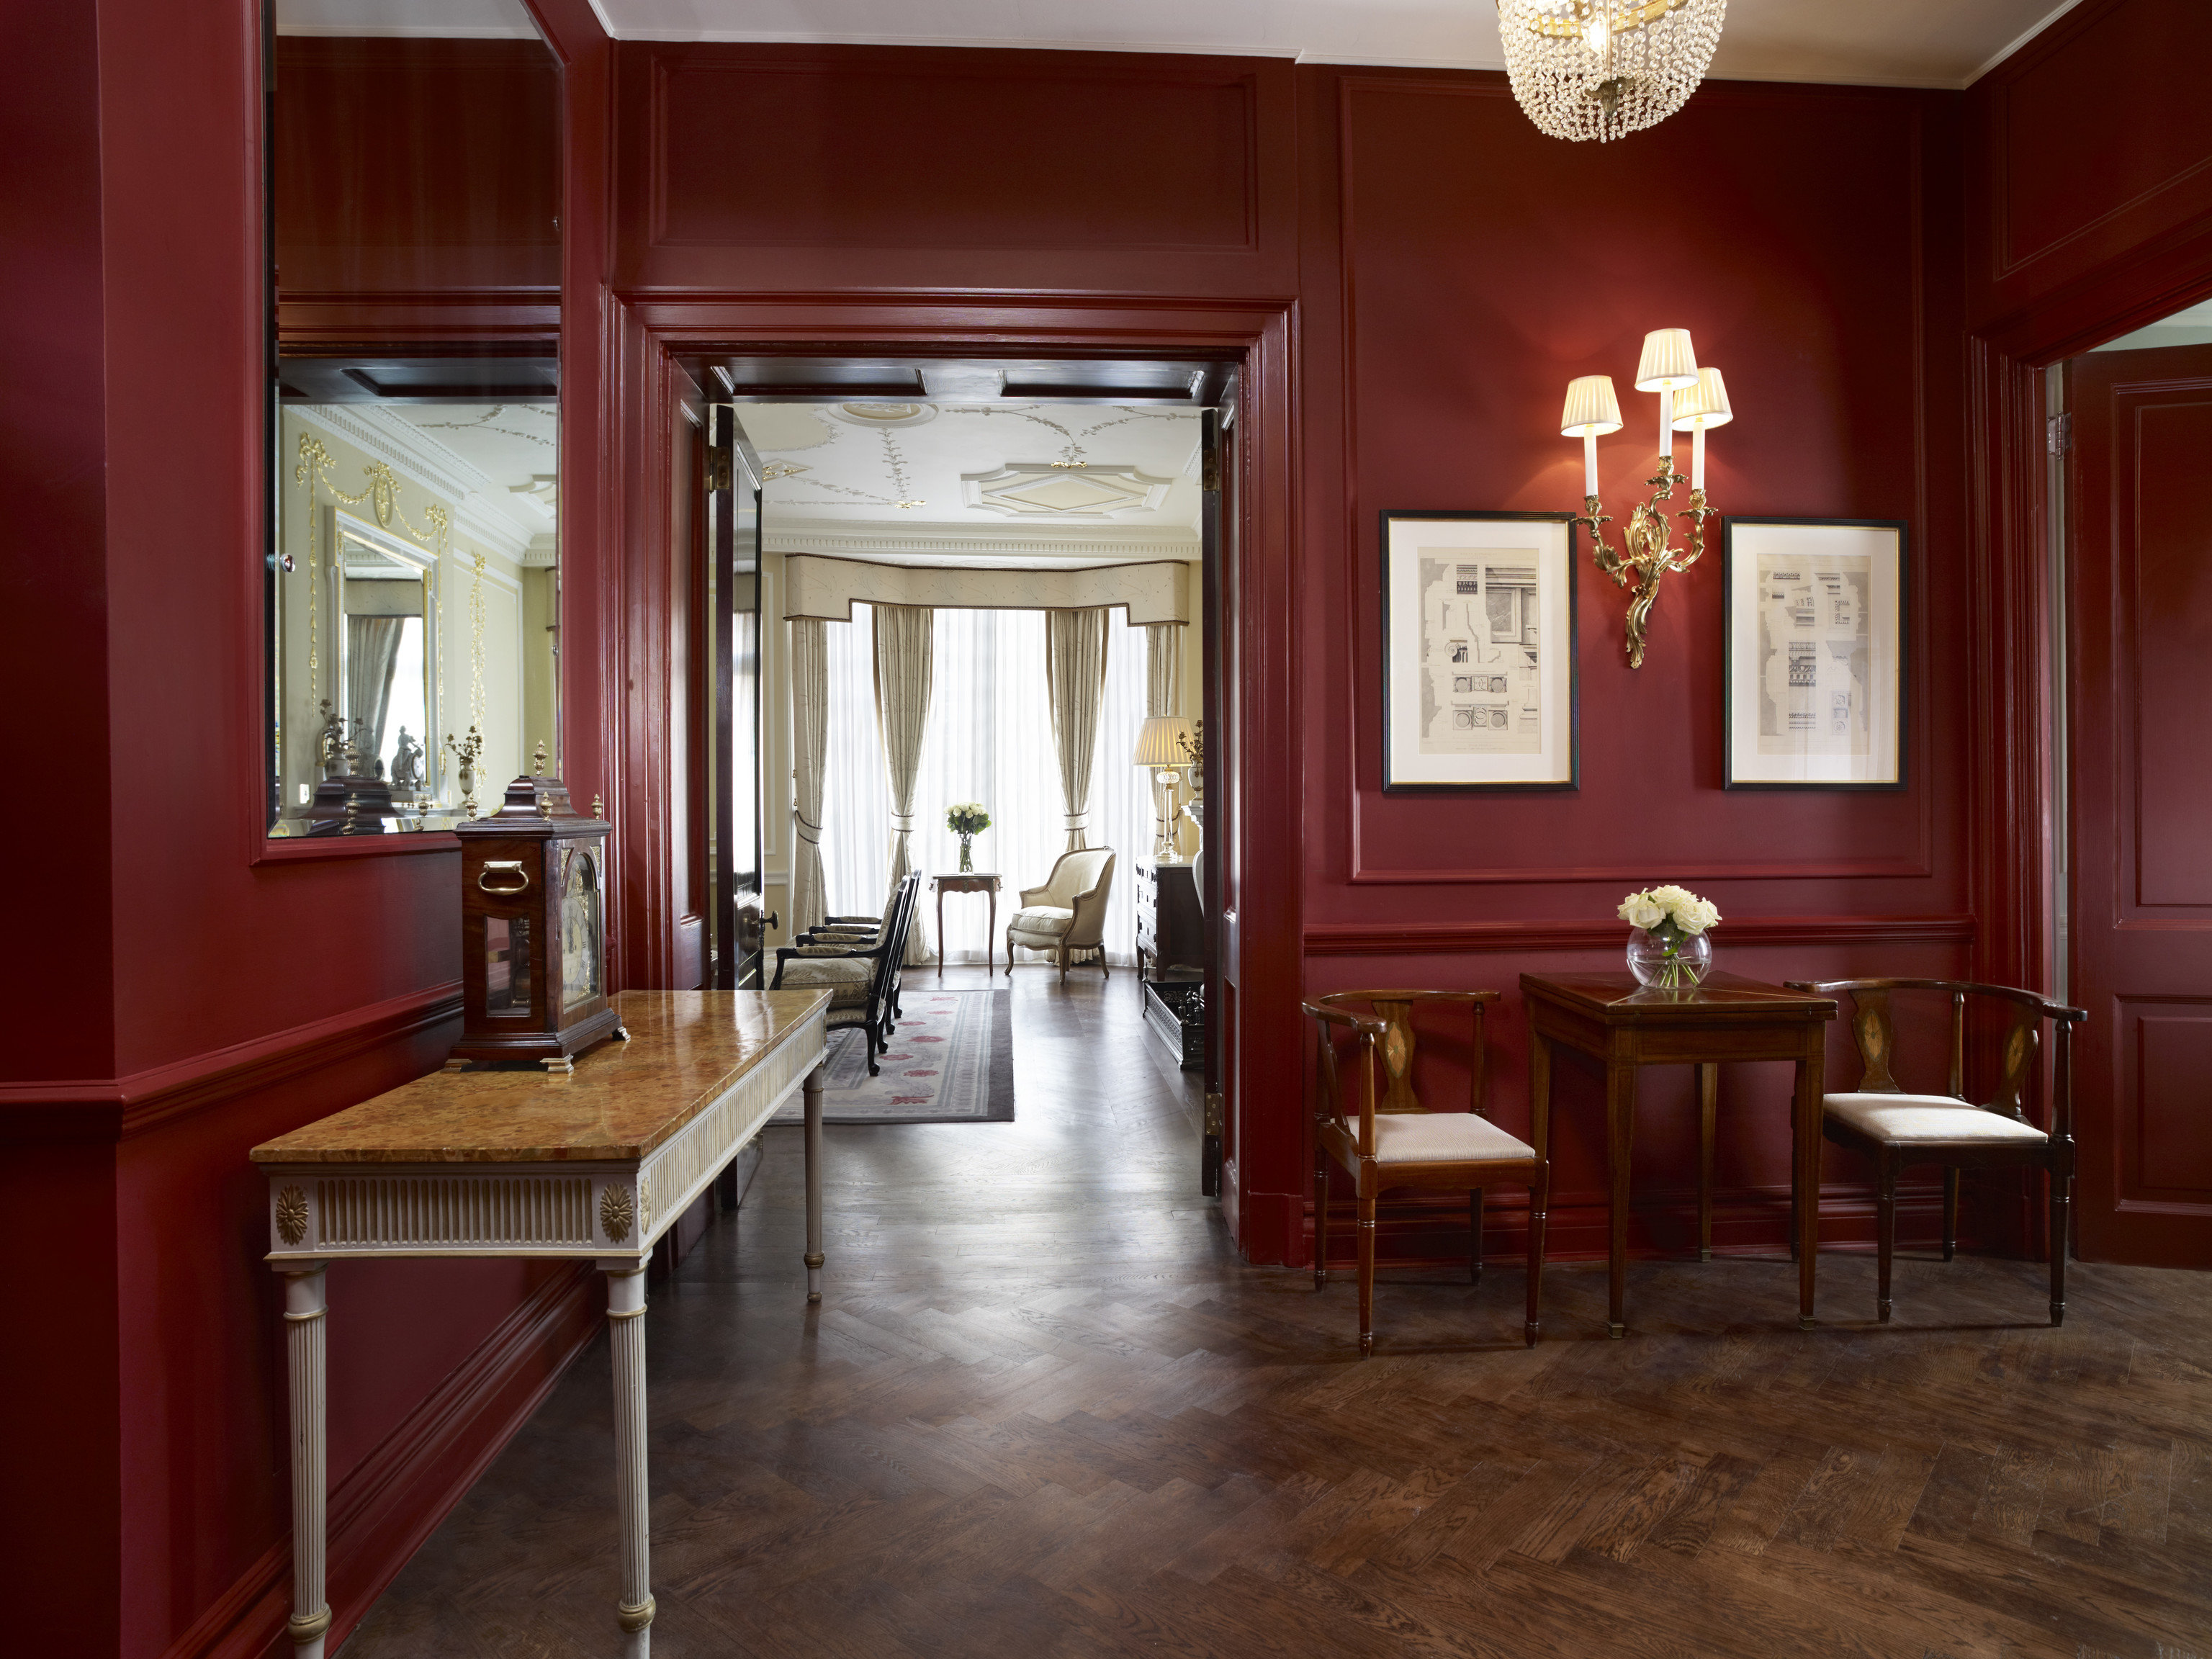 Hotels Luxury Travel floor indoor room window interior design ceiling Lobby wall furniture red flooring dining room table wooden living room hall chair interior designer wood